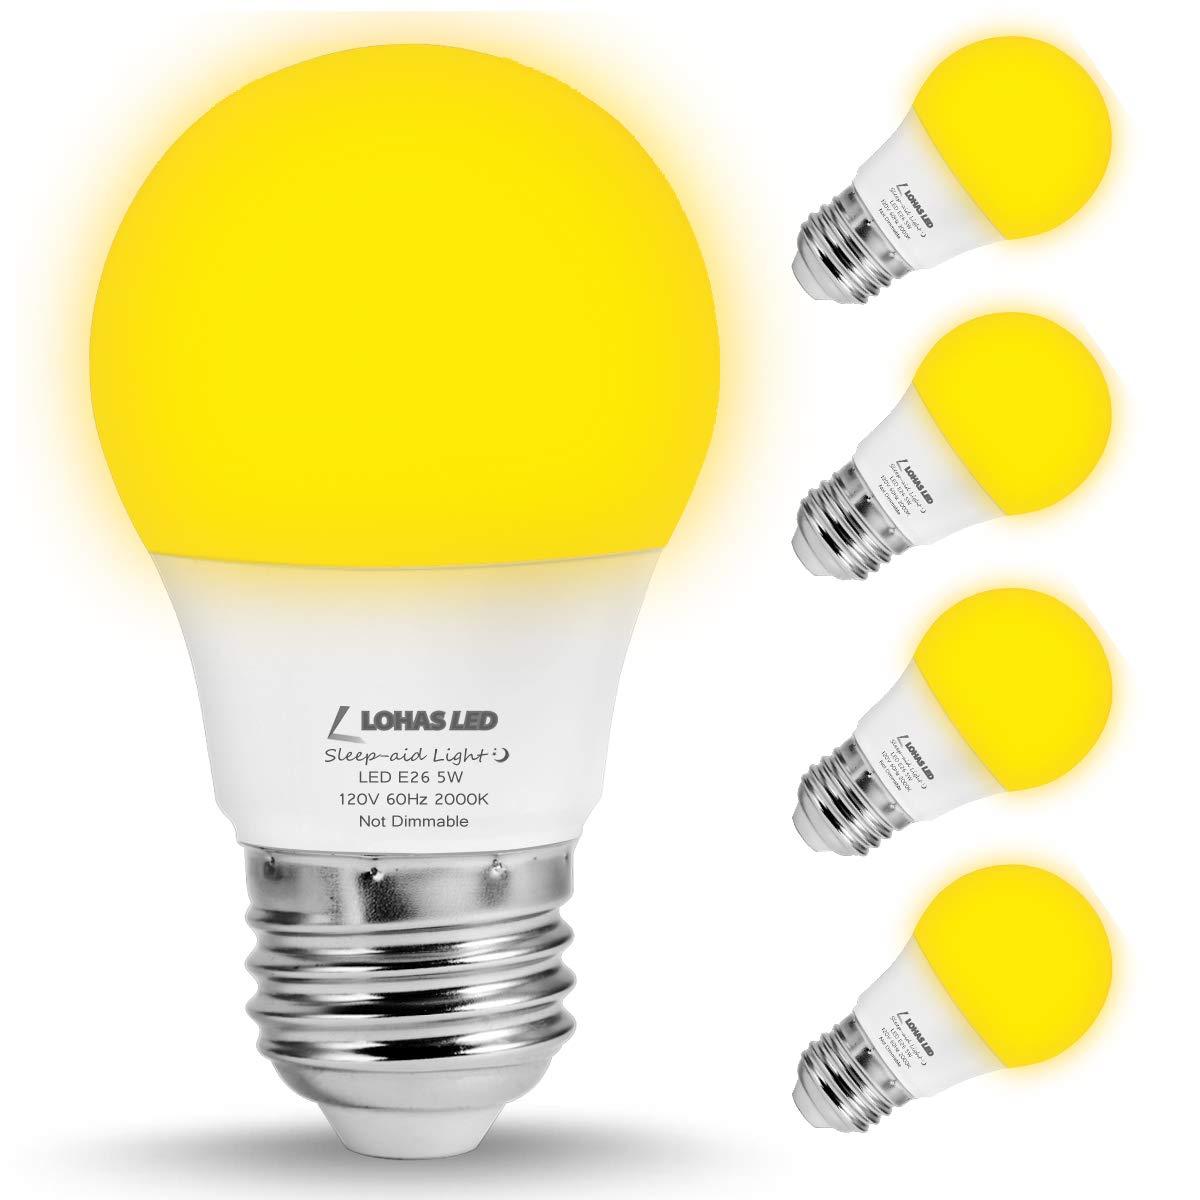 LOHAS Bug Light Bulb Yellow LED Bulbs, Outdoor Porch Lights, Amber Bedroom Night Light Bulb A15 Bugs Free Bulbs, 40W Equivalent E26 Edison Bulb(5W), Warm LEDs Hallway Lighting Decorative Lamps(4 Pack)